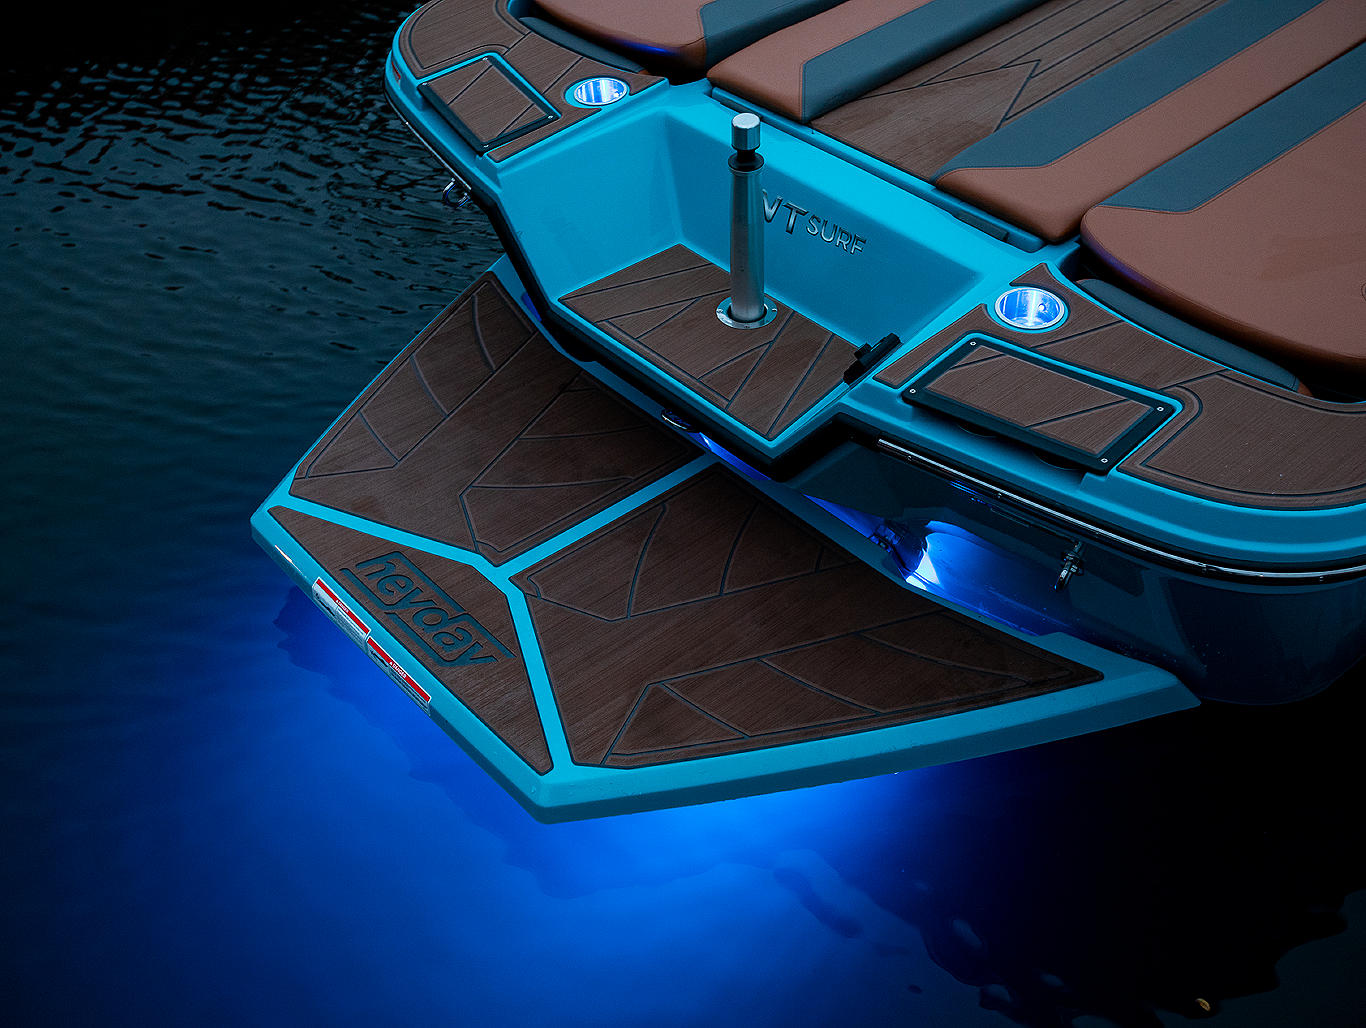 WTSurf-Swim-Platform